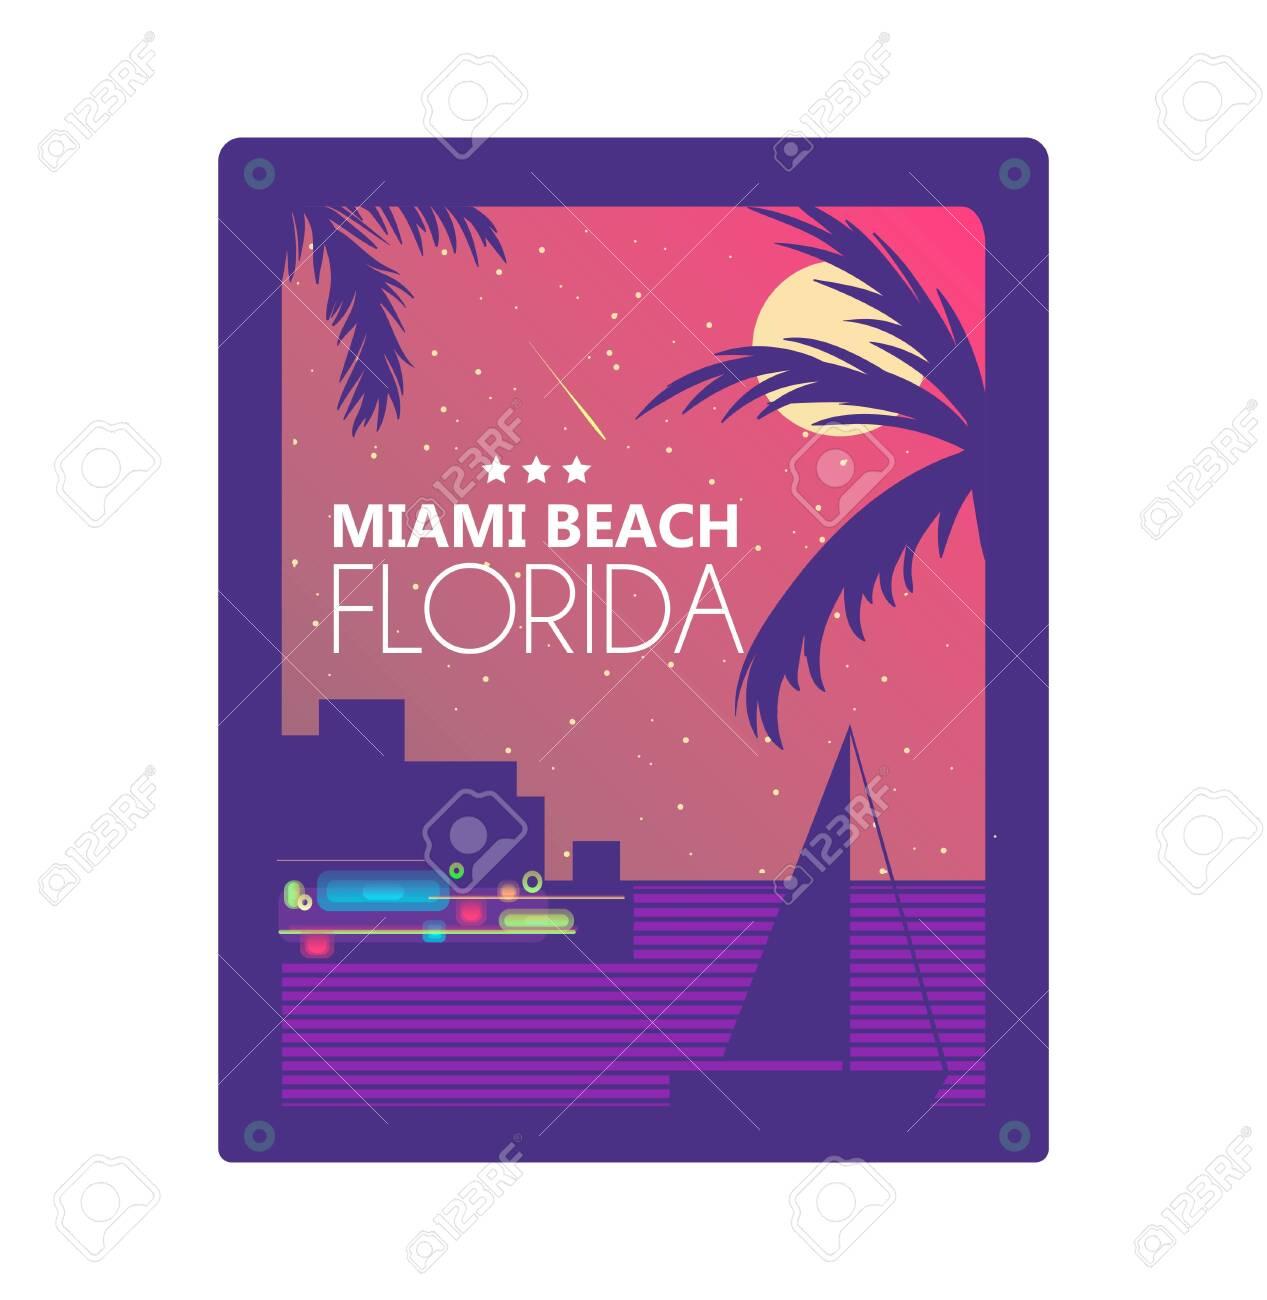 Miami summer concept vector graphic design for print - 128367685